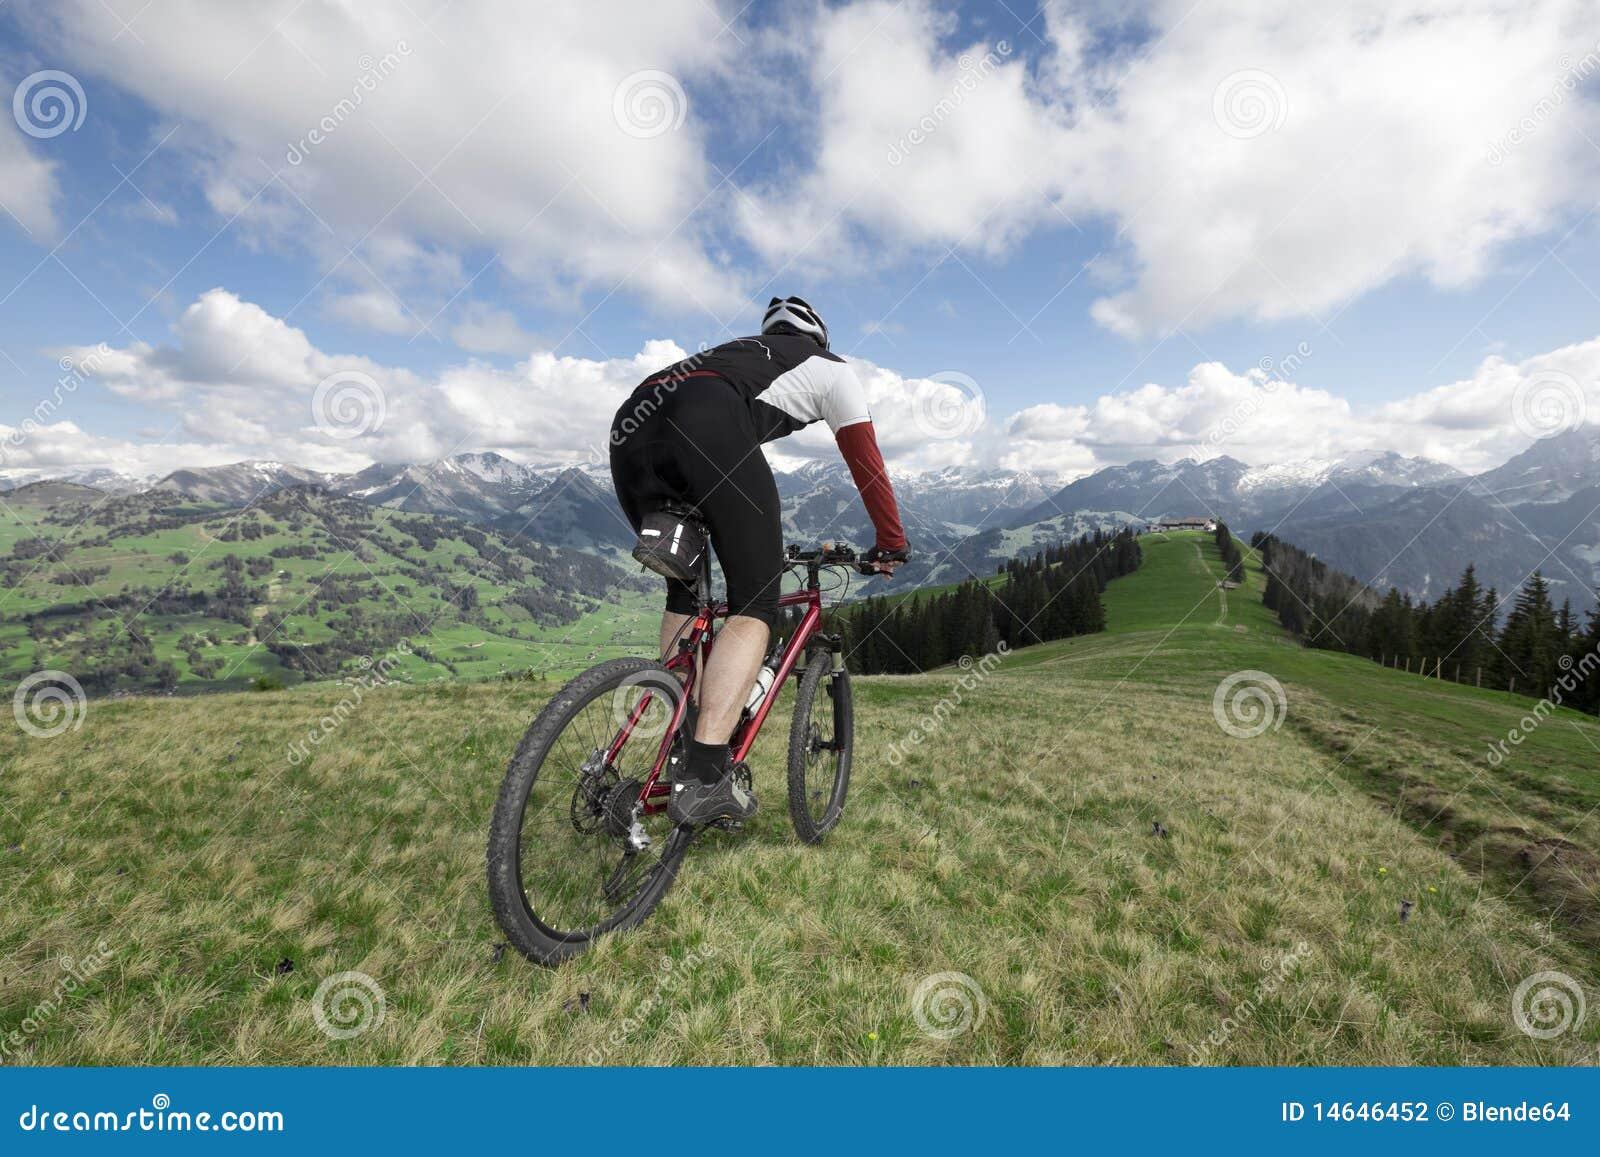 Mountainbiker Bike View Mountain Stock Image ...